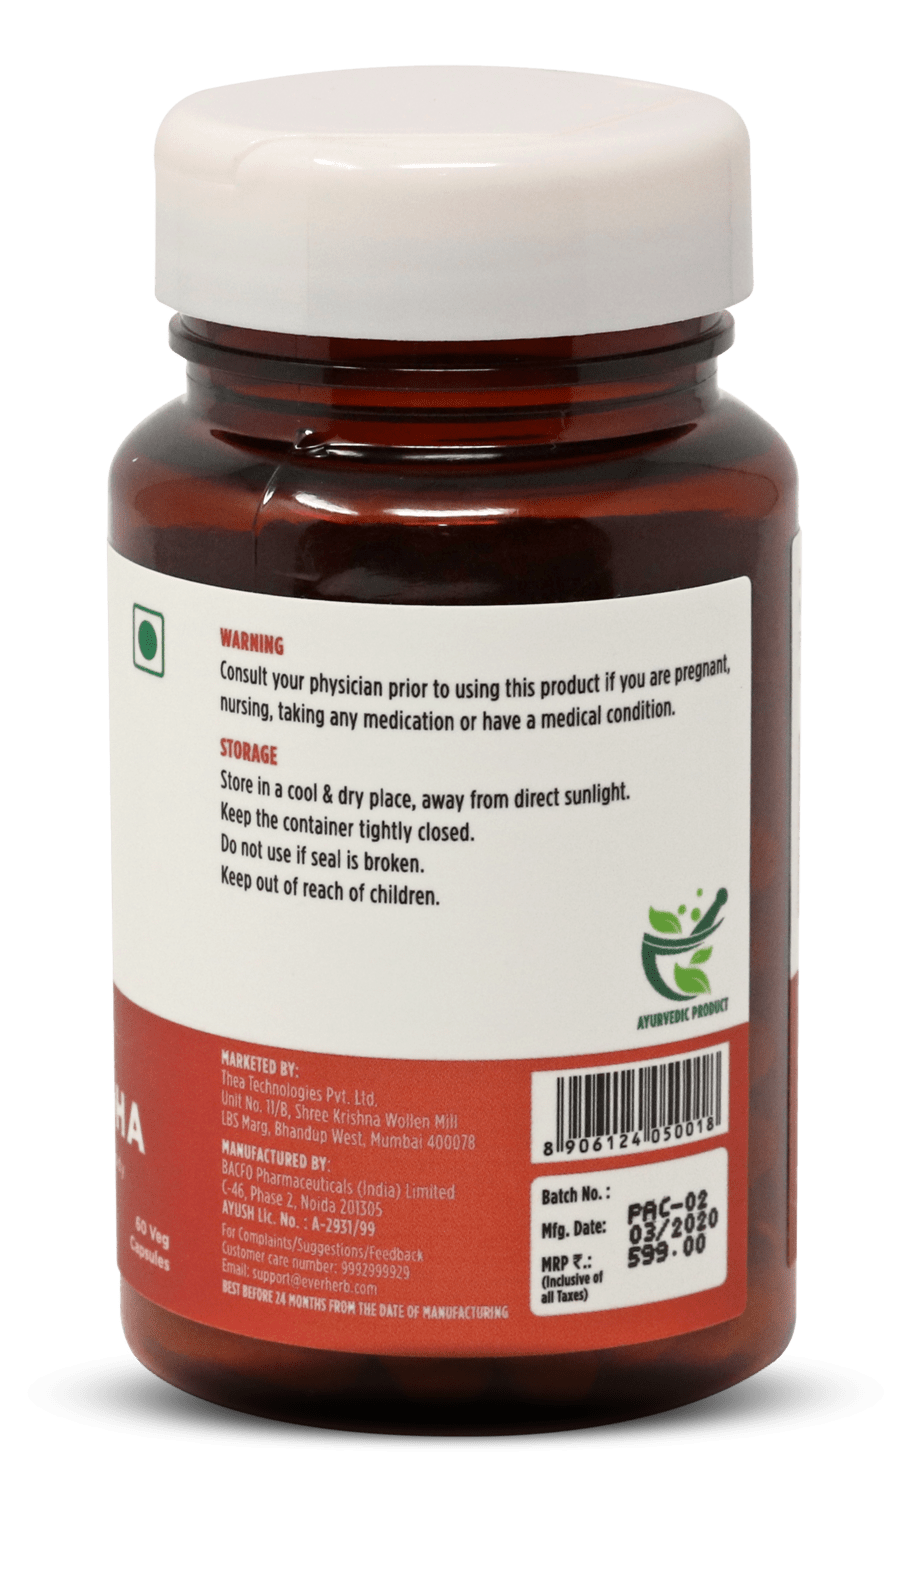 Everherb Ashwagandha - Anxiety & Stress Relief, Improves Memory, Anti-ageing, Anti-oxidant - 60 Veg Capsules